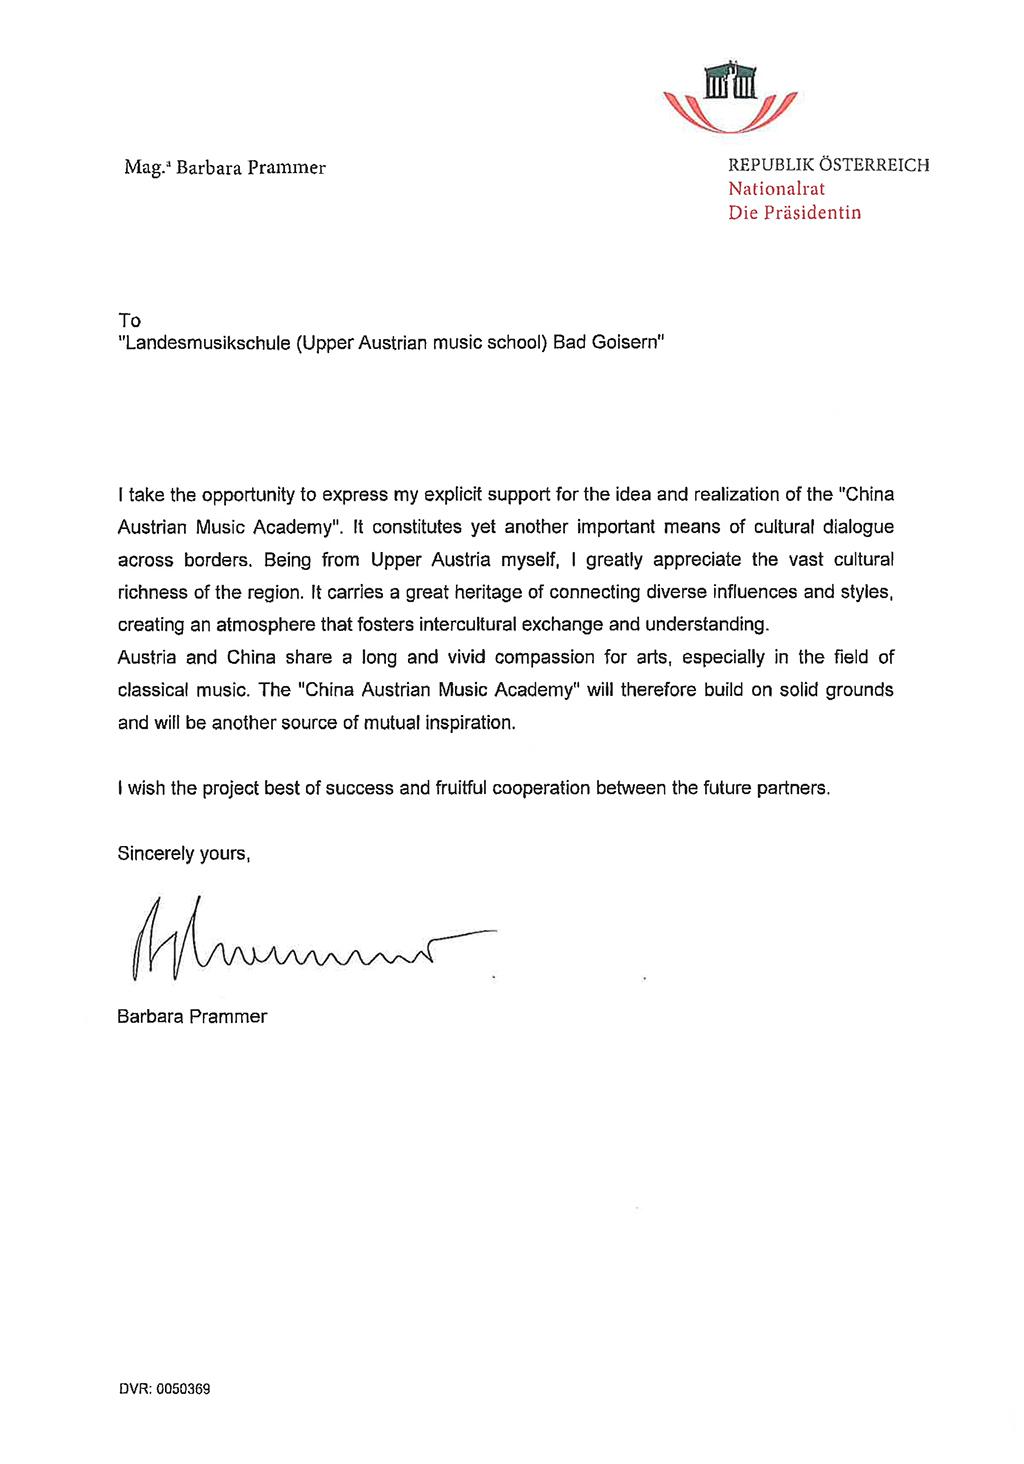 Summer student cover letter